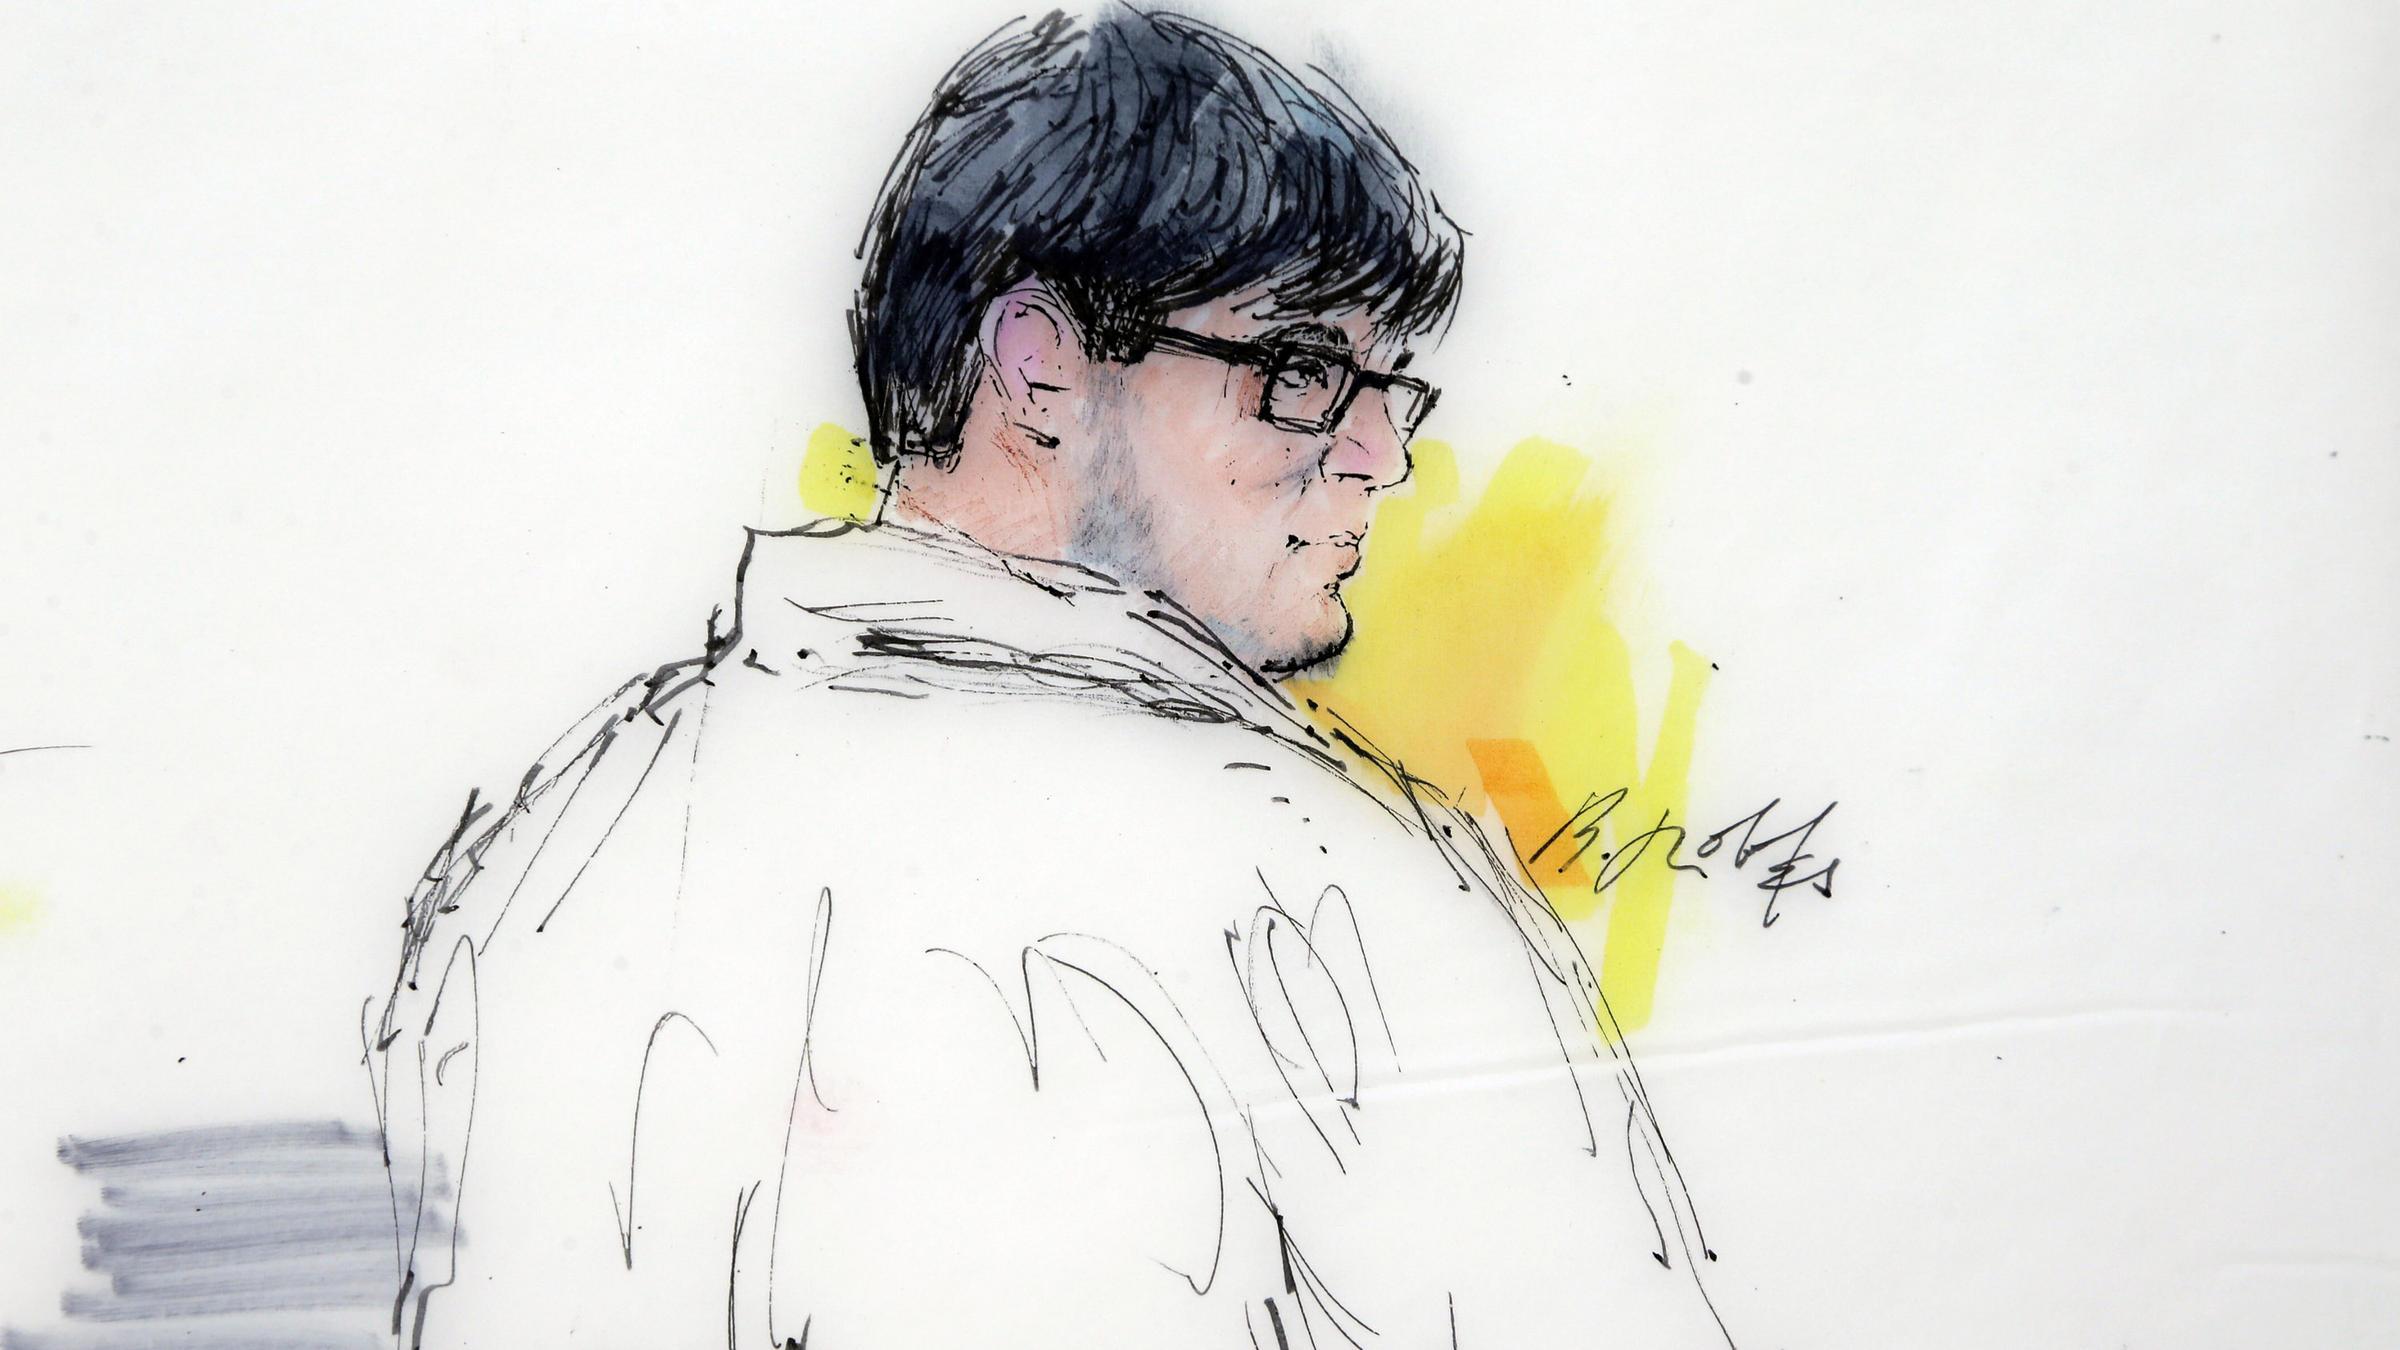 San Bernardino, Calif., attacker's friend enters plea deal